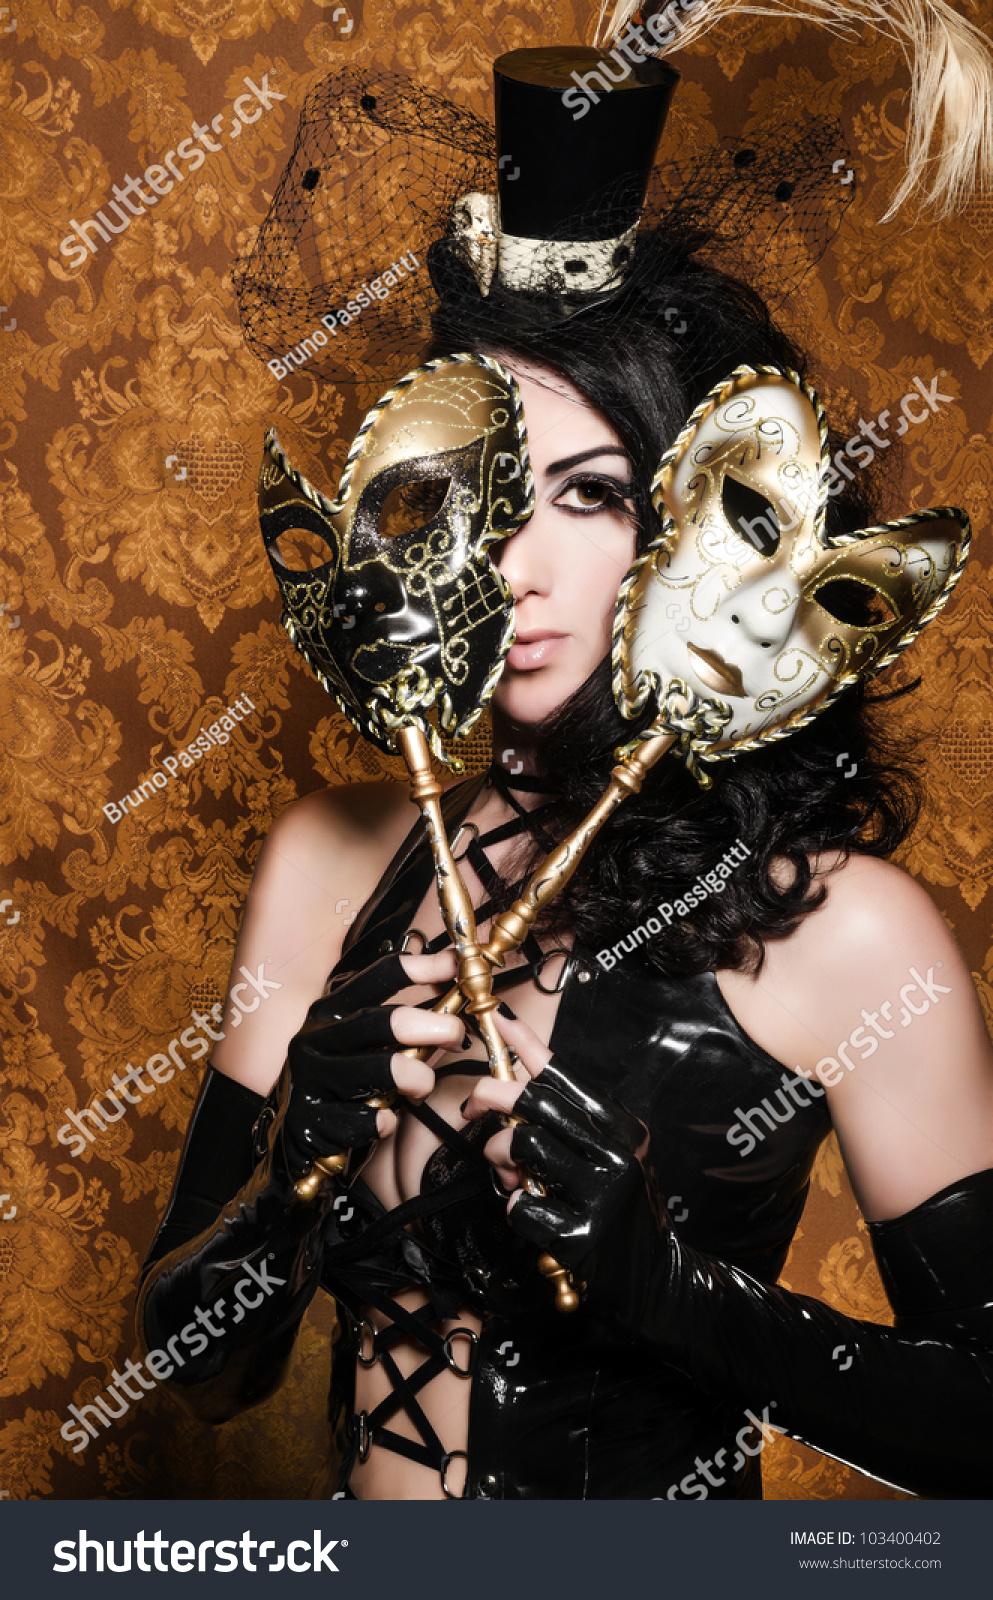 Lilith p orn pics pron photos